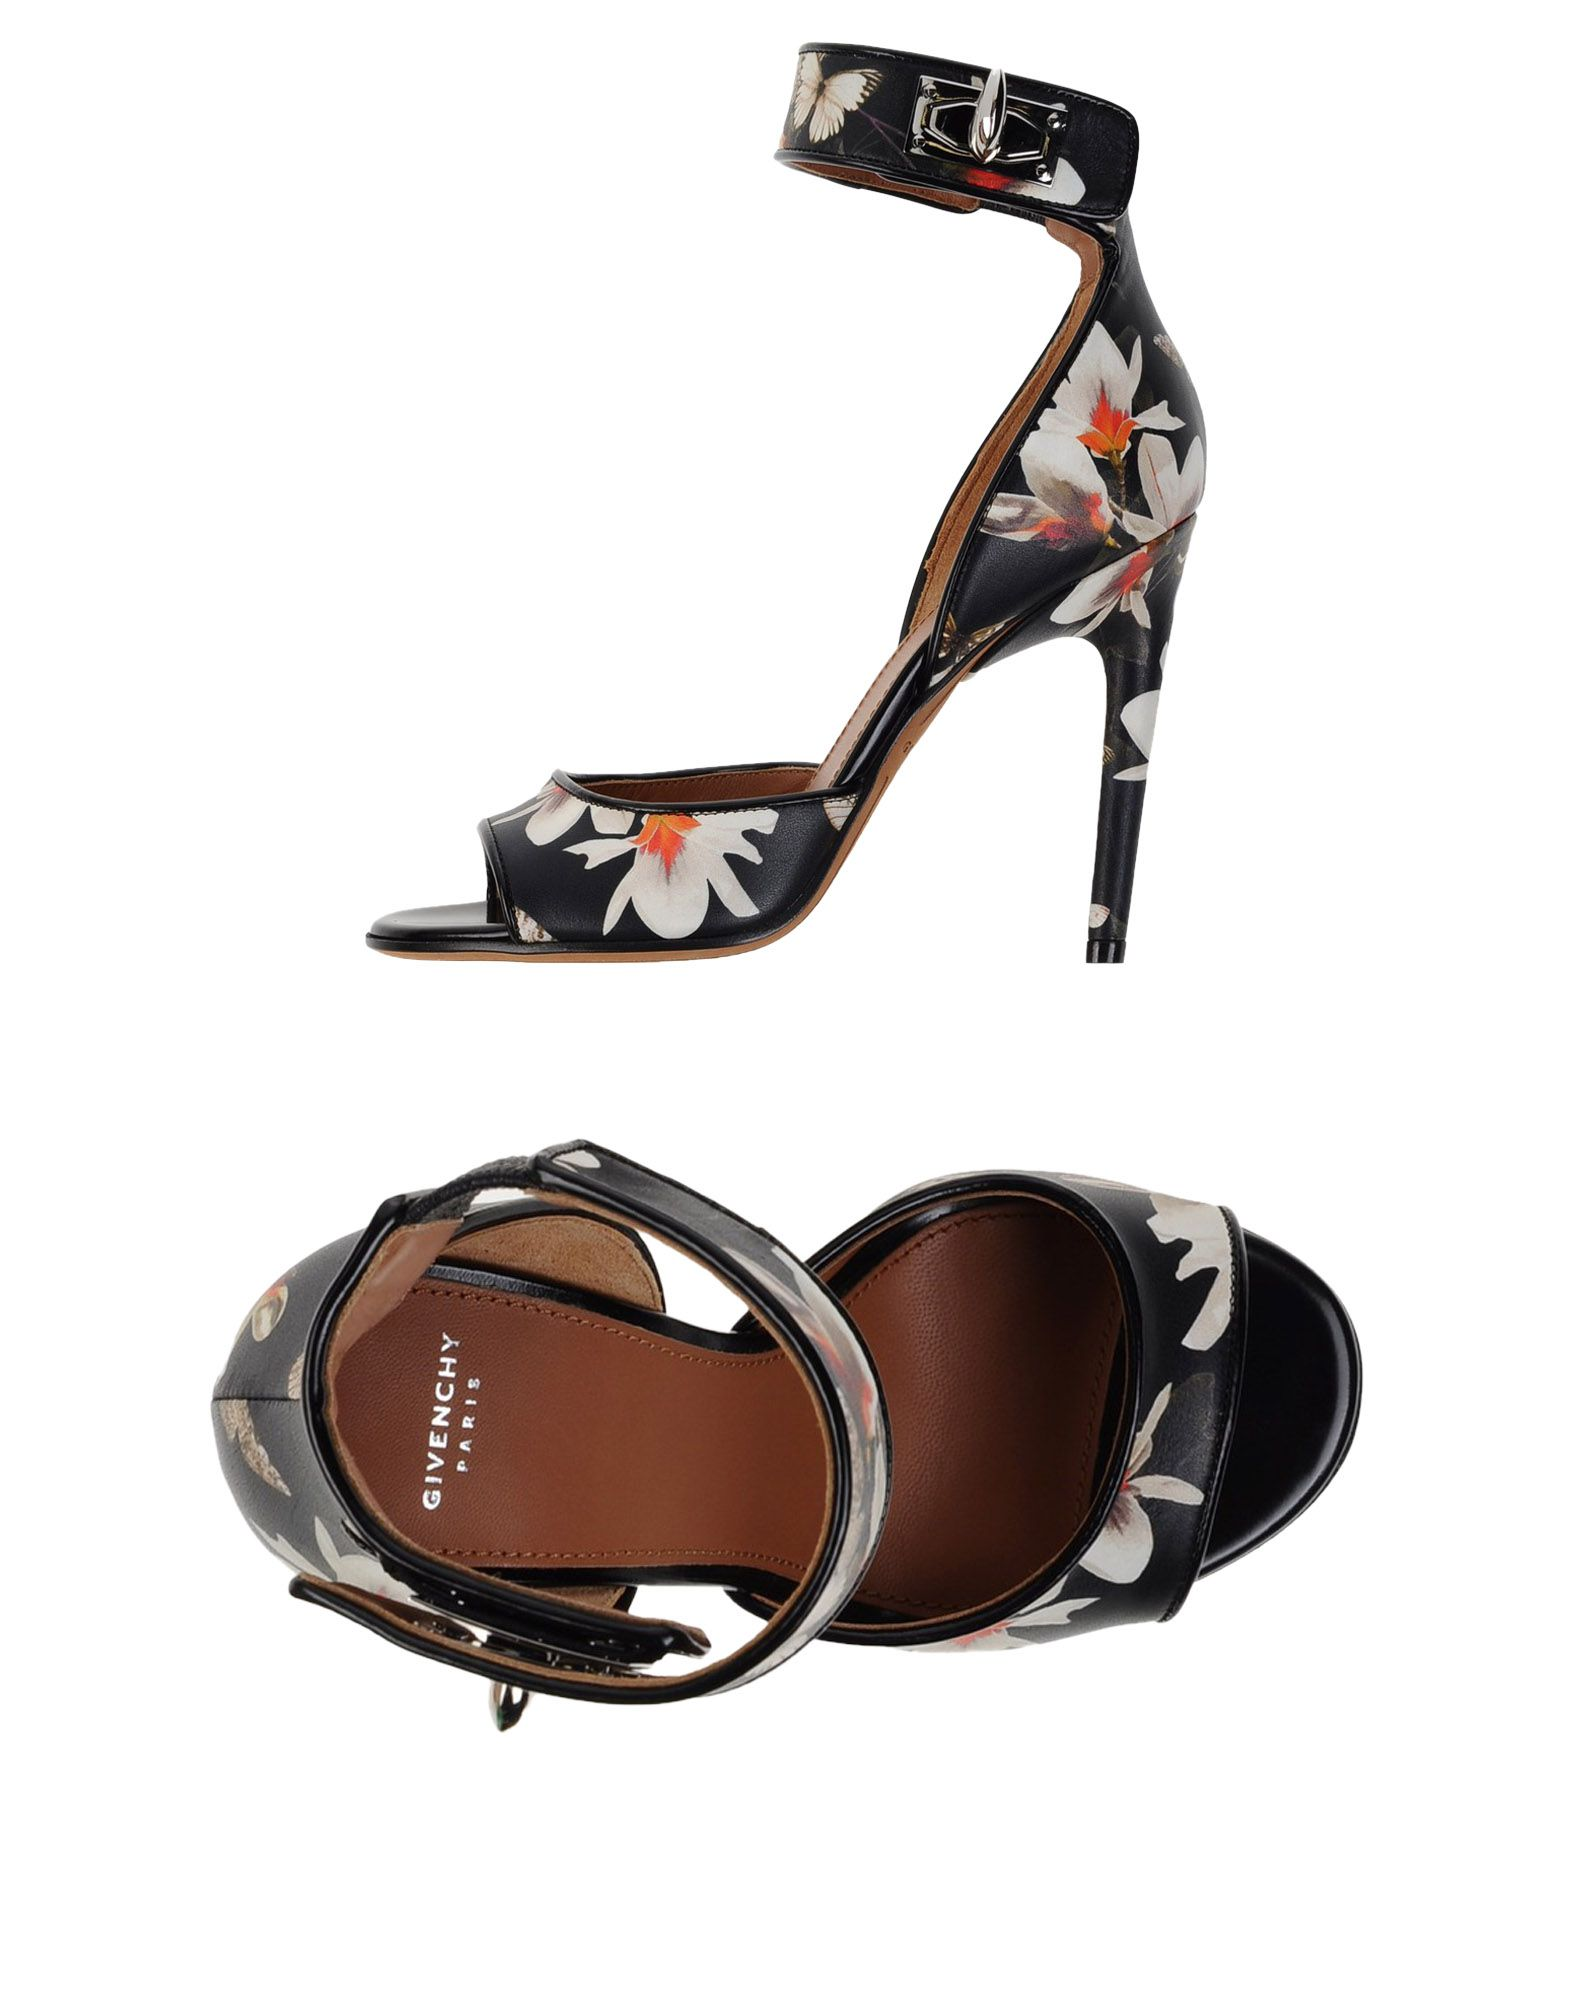 Givenchy Sandals - Women Givenchy Sandals online on 44839607PT  United Kingdom - 44839607PT on 3366e9